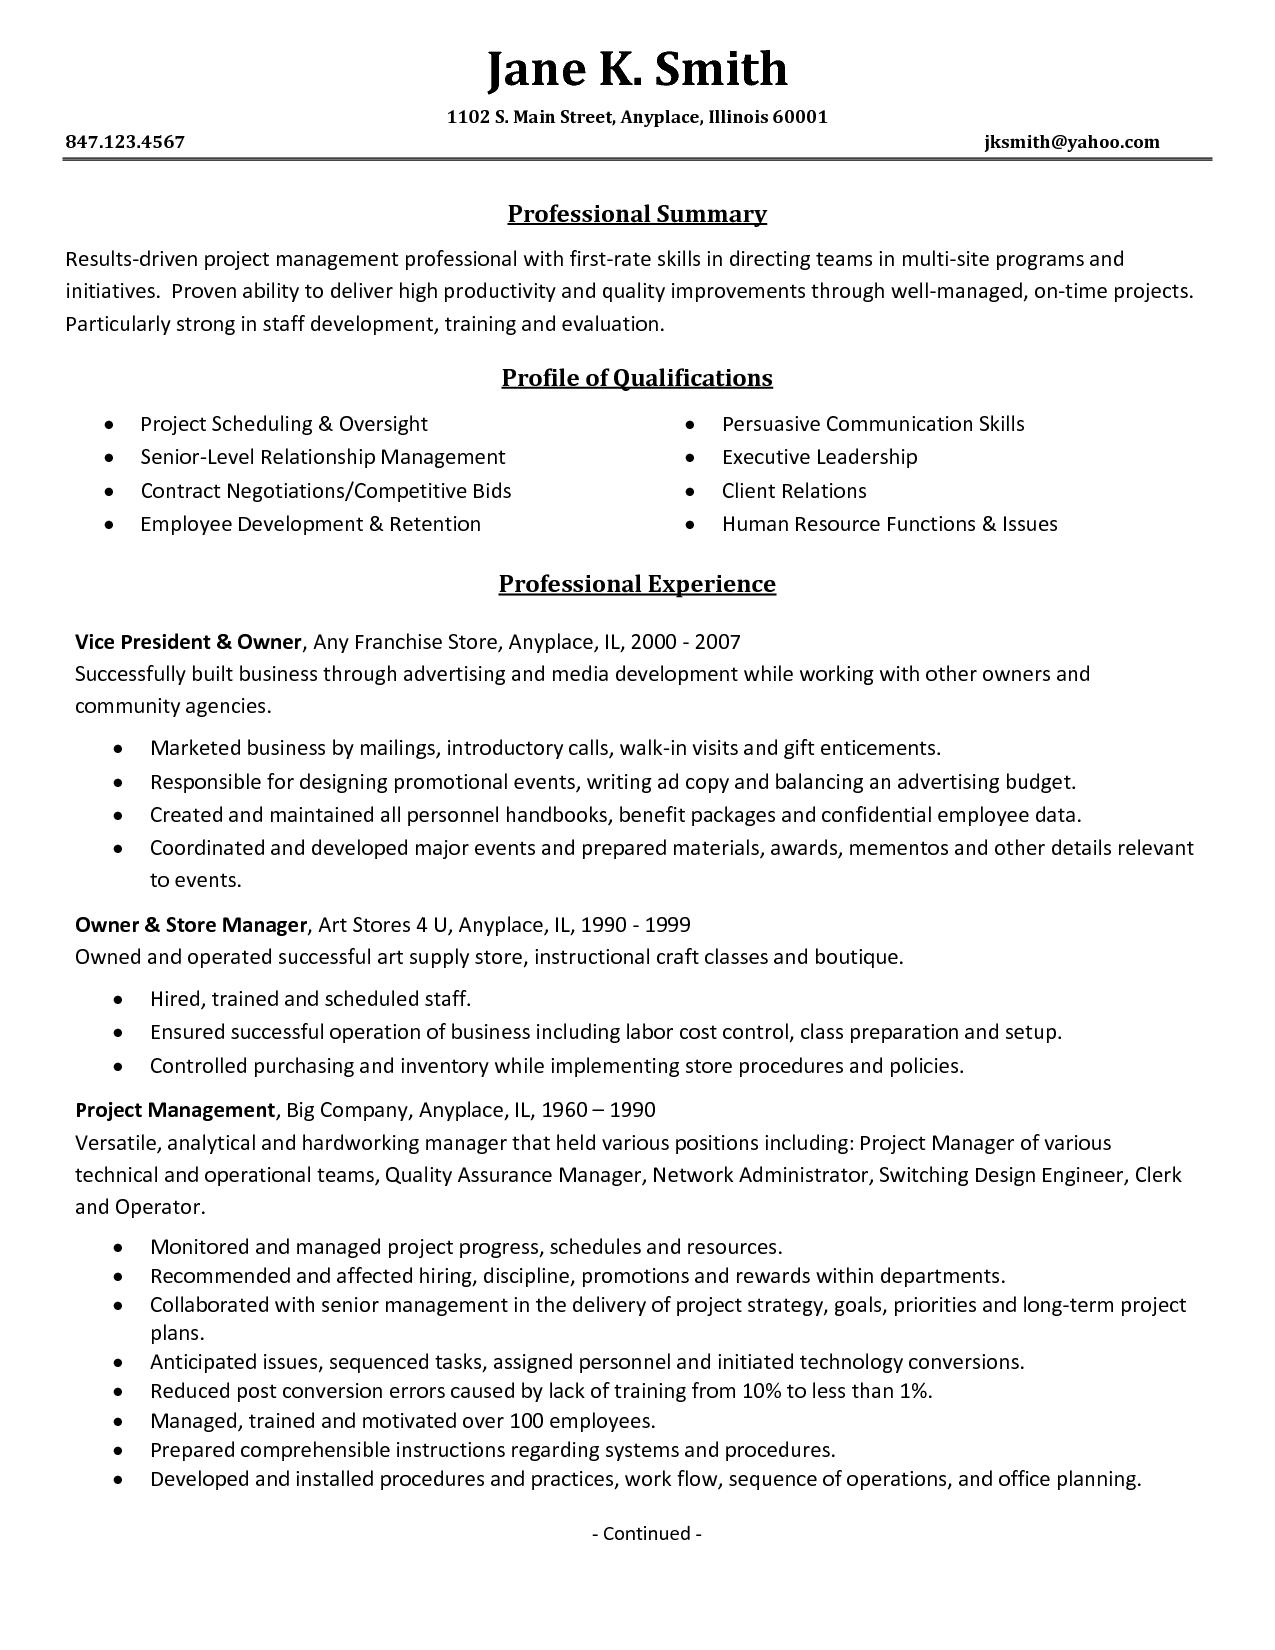 resume examples of leadership skills